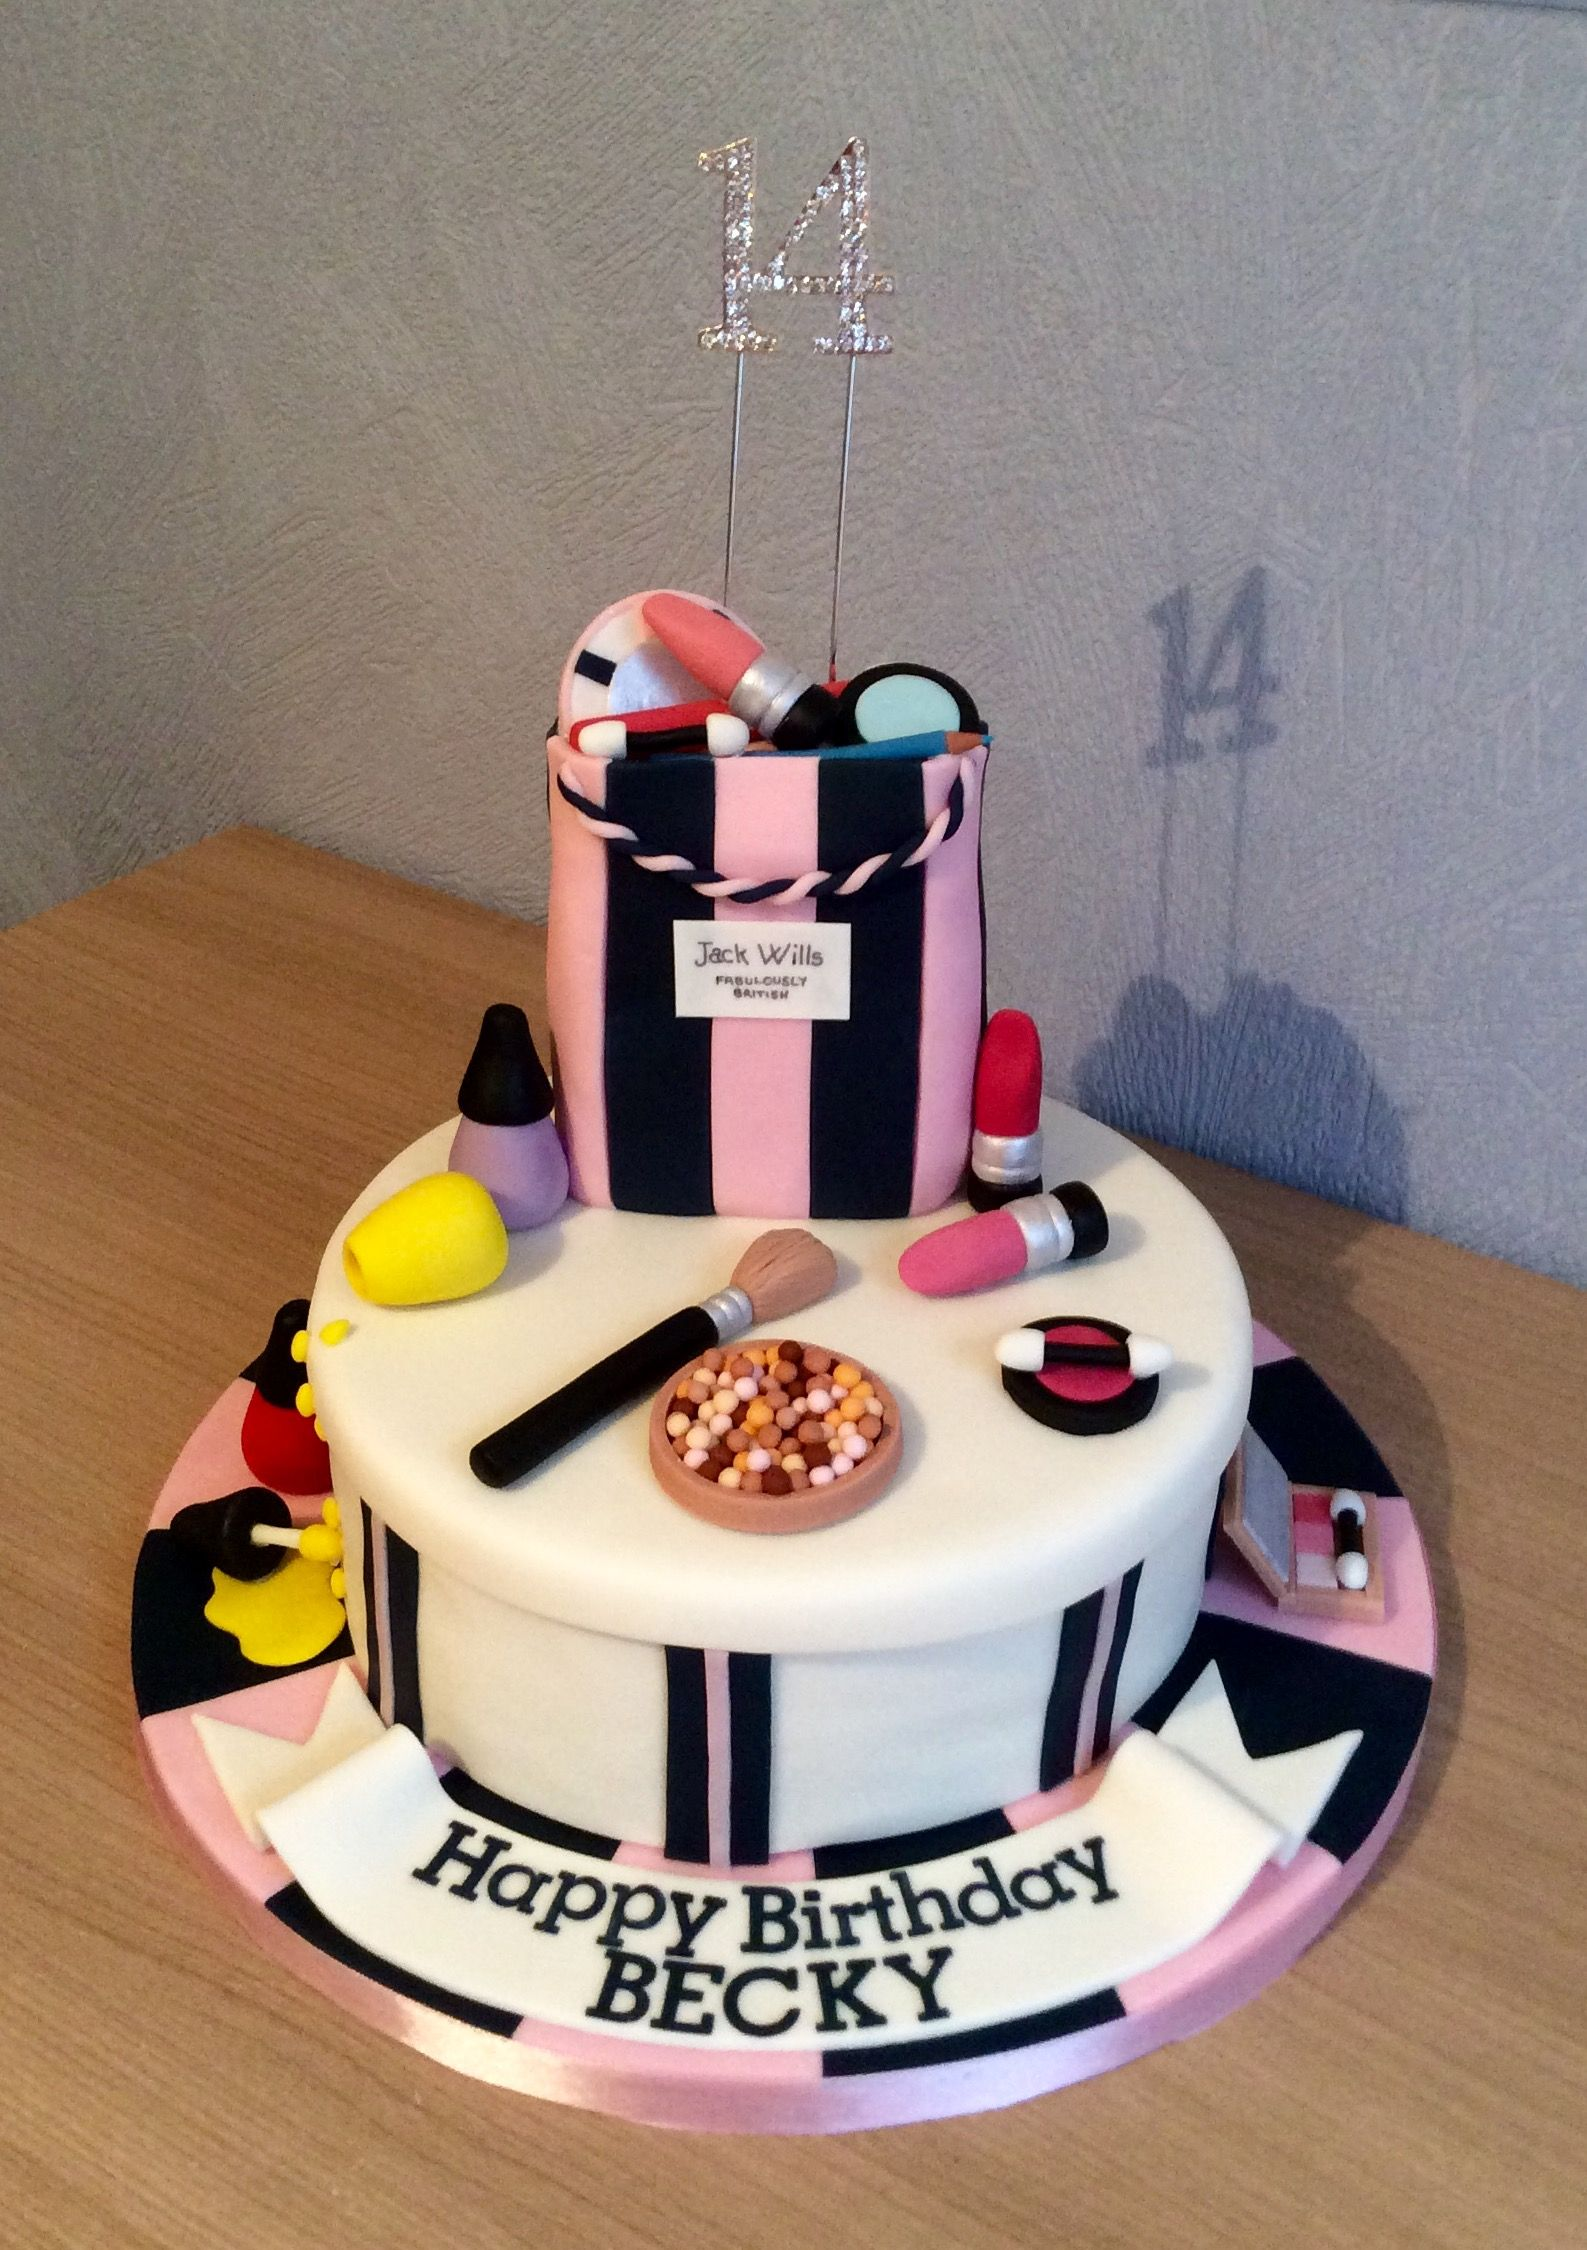 Jack Wills Cake